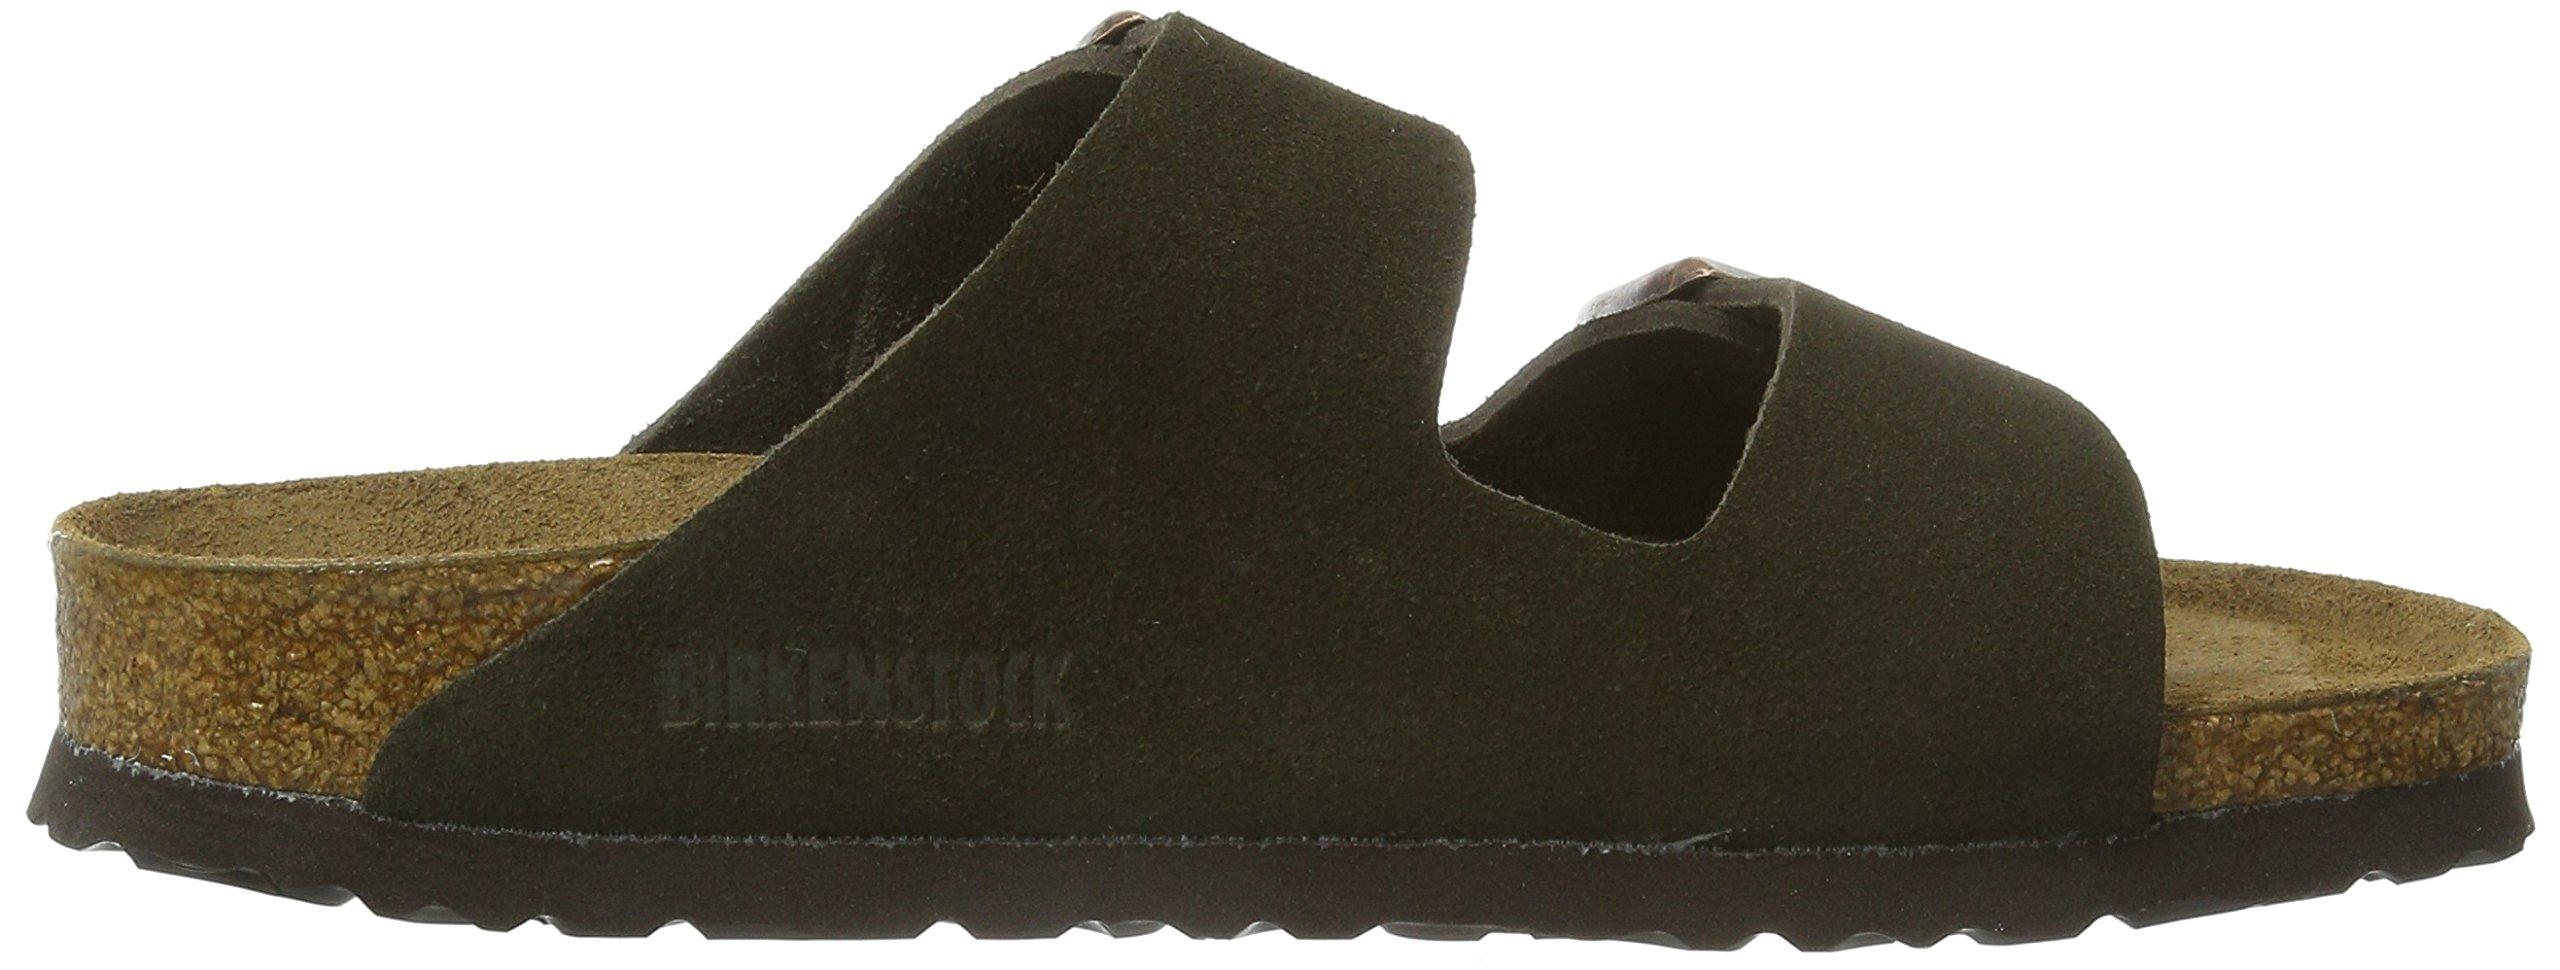 Birkenstock Women´s Arizona Mocha Suede Sandals 37 N EU N 951313 by Birkenstock (Image #6)